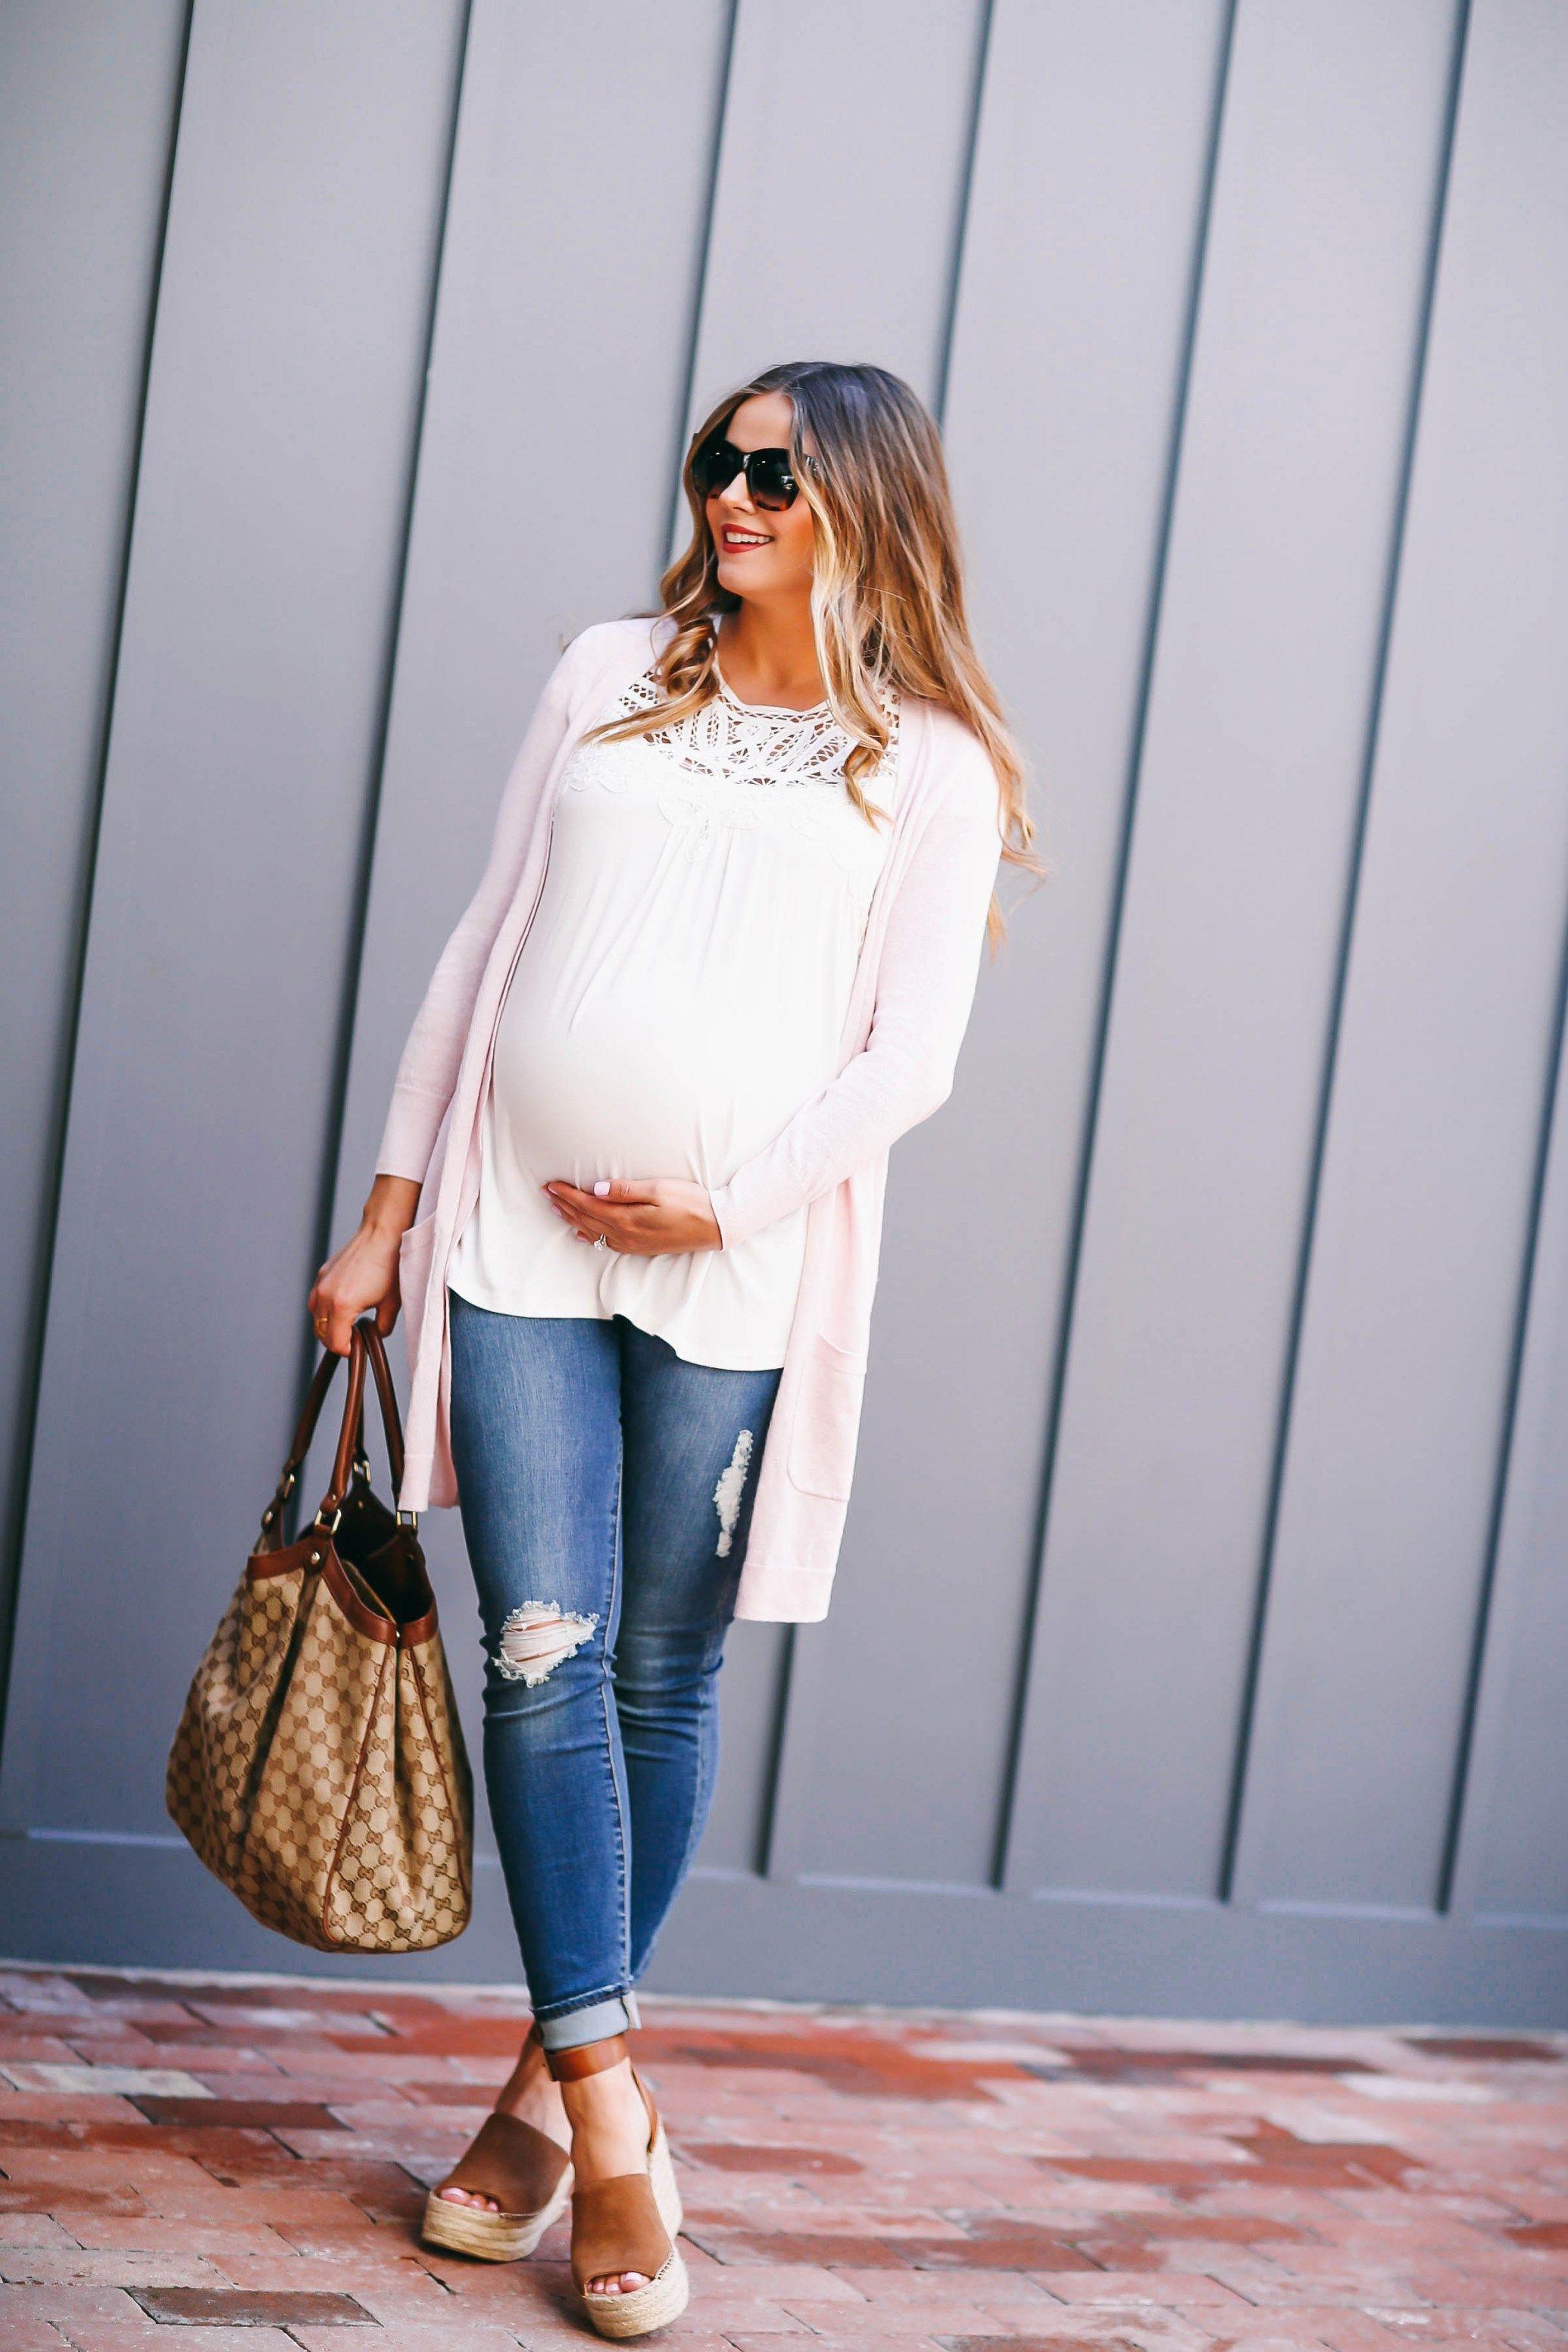 3975febeb2ca2 #BumpStyle // Blush Pink Cardi & The Best Affordable Maternity Jeans |  BondGirlGlam.com